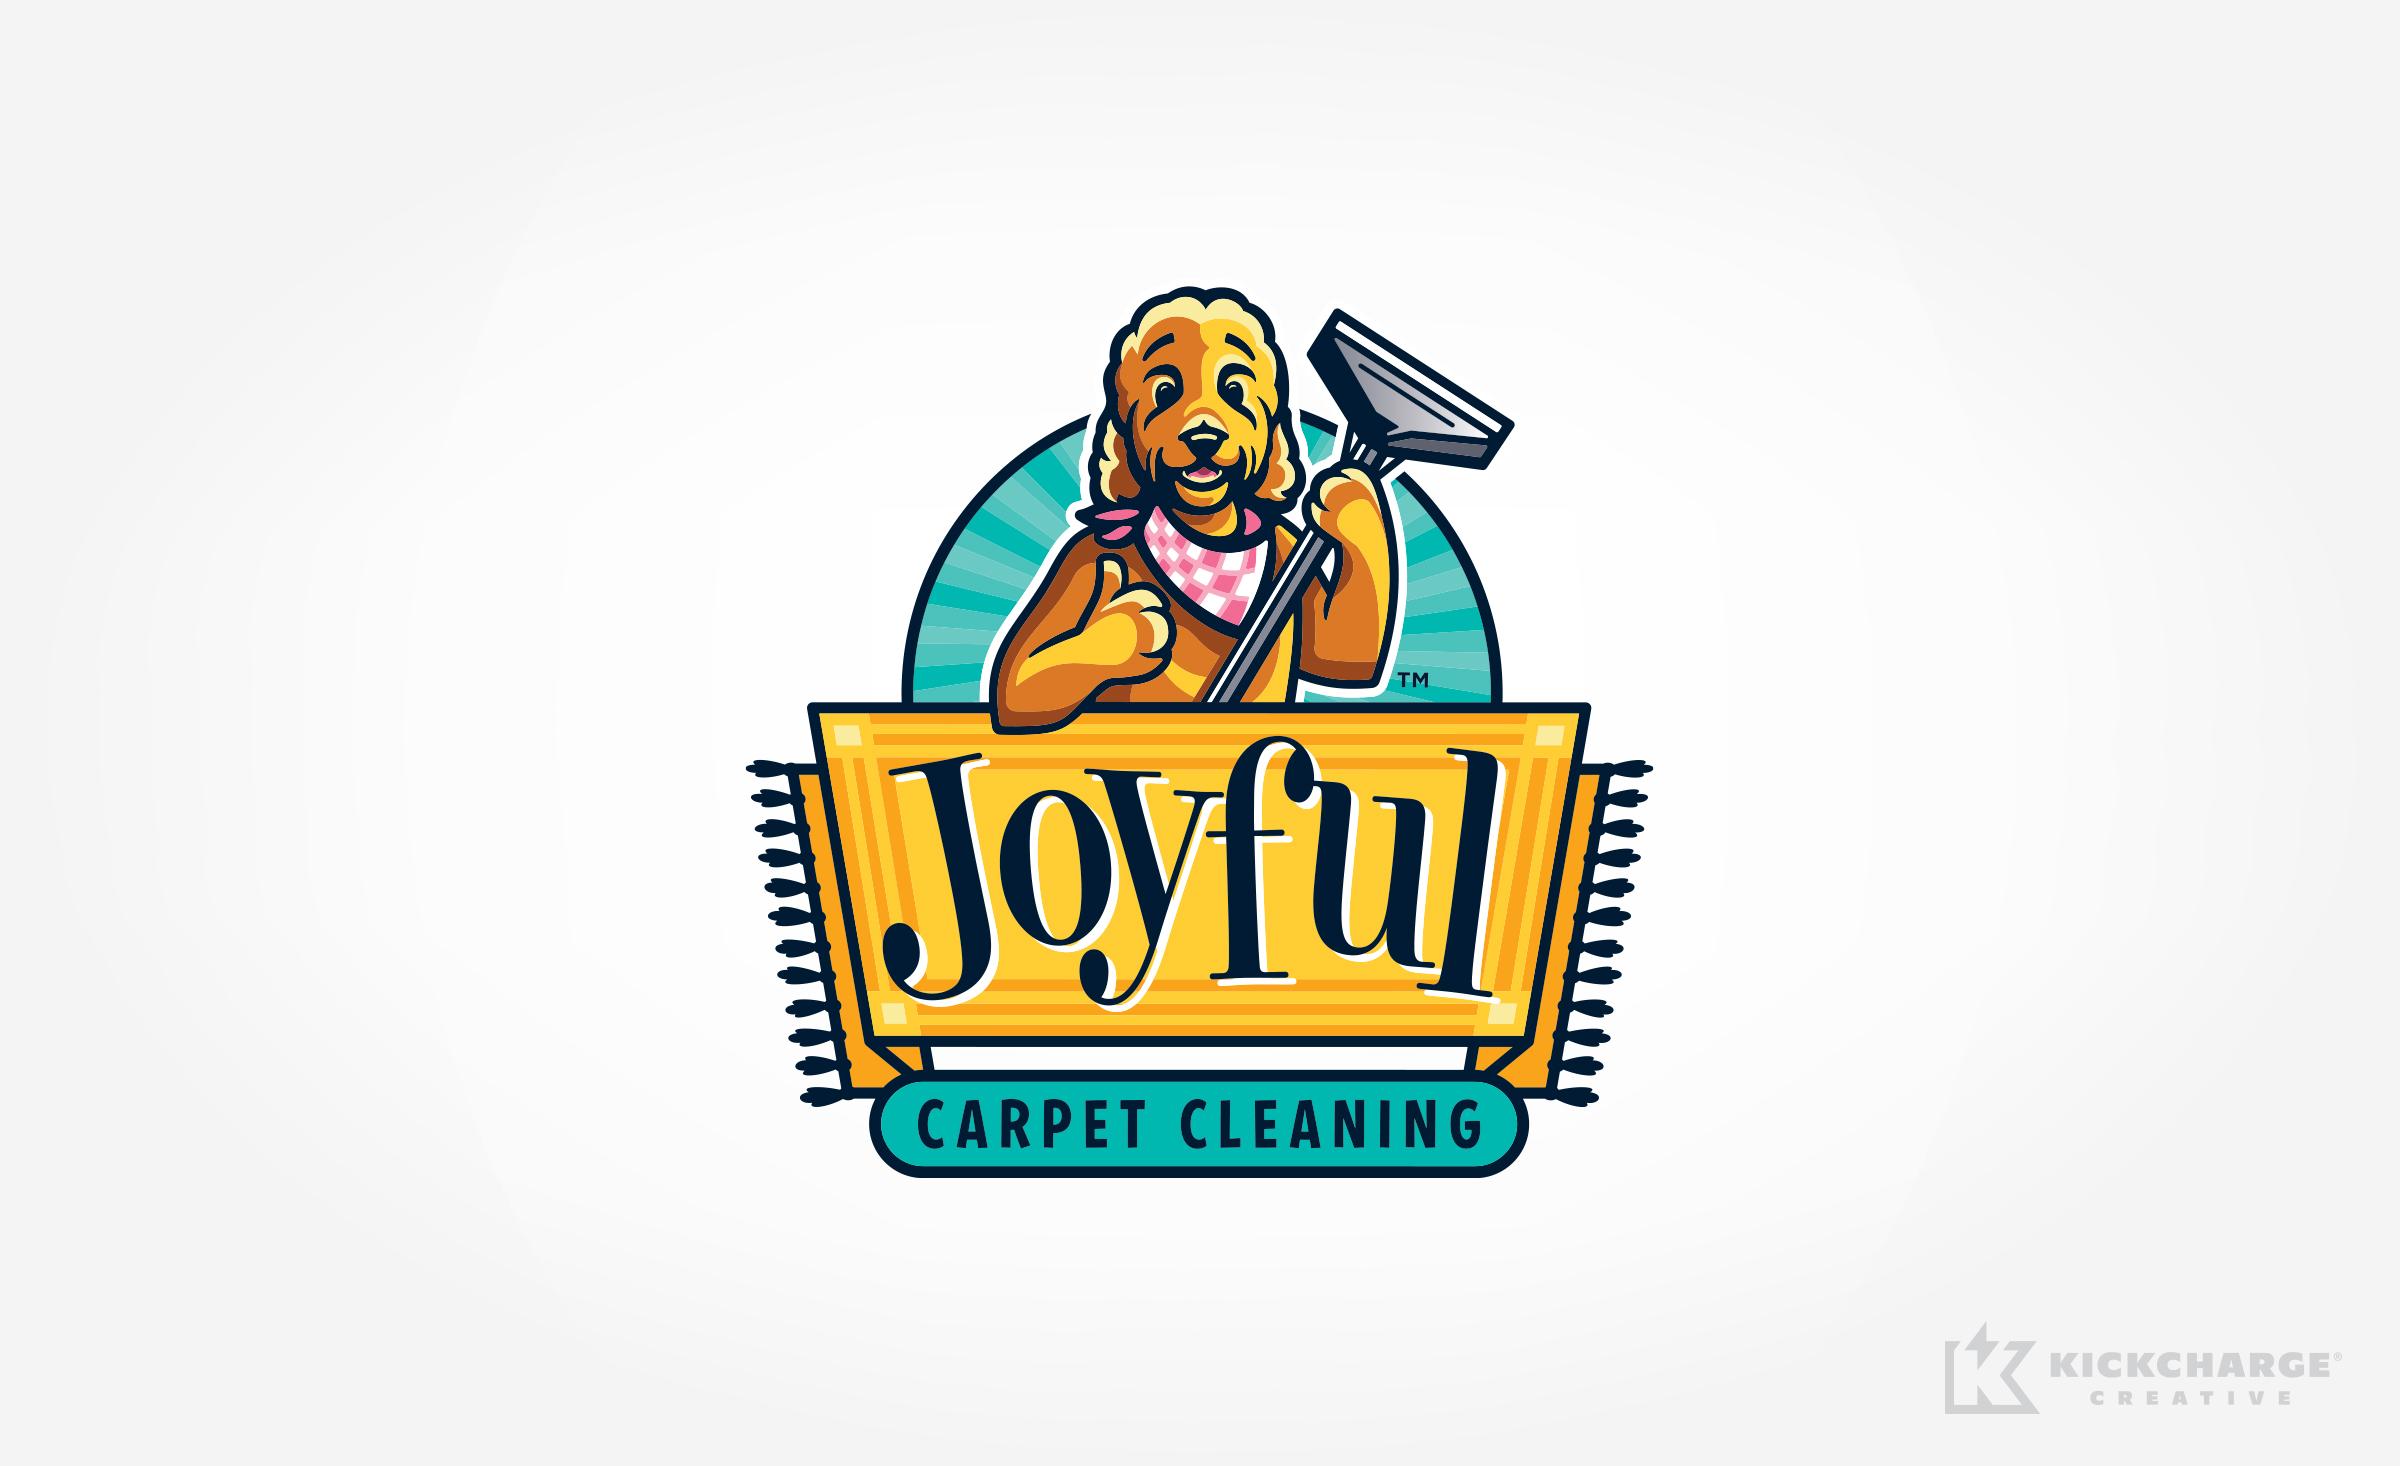 Joyful Carpet Cleaning